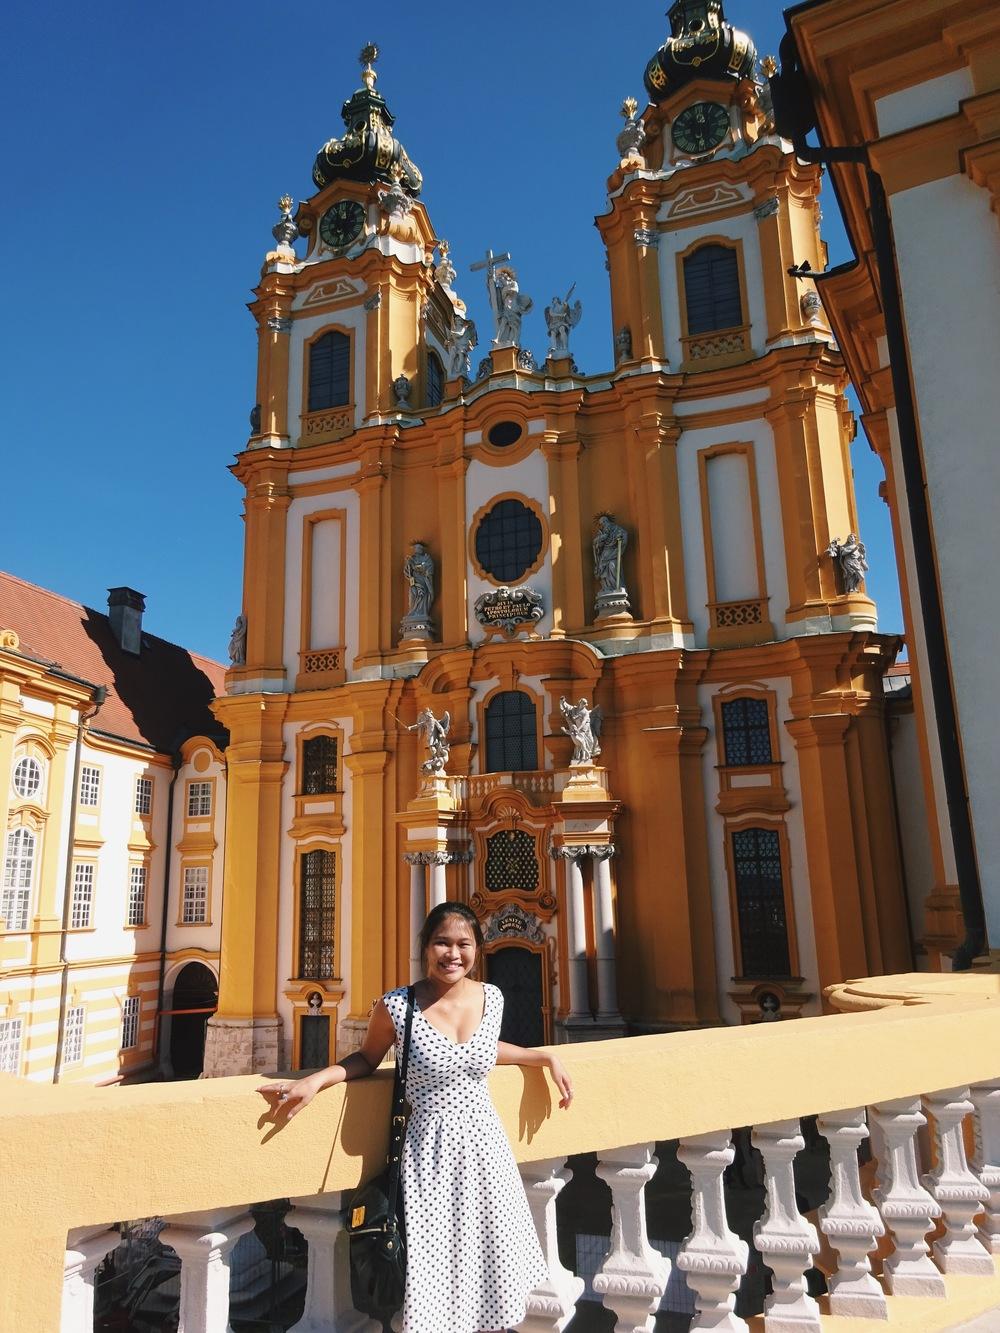 Kirche, Vienna, Austria